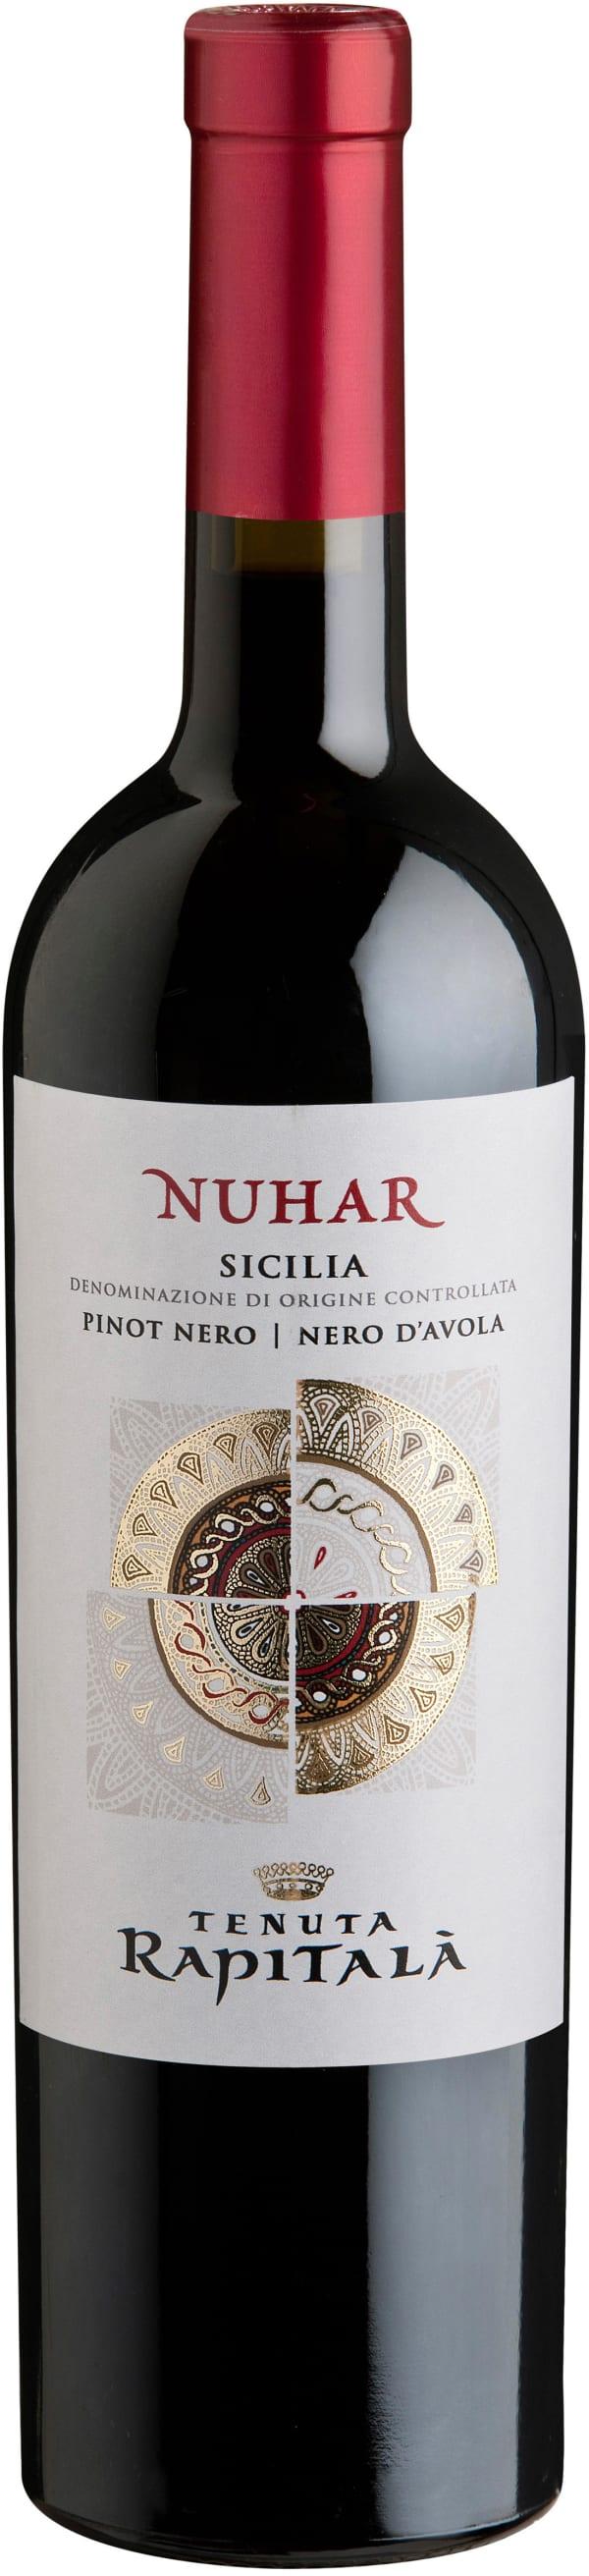 Rapitala Nuhar Pinot Nero Nero d'Avola 2017